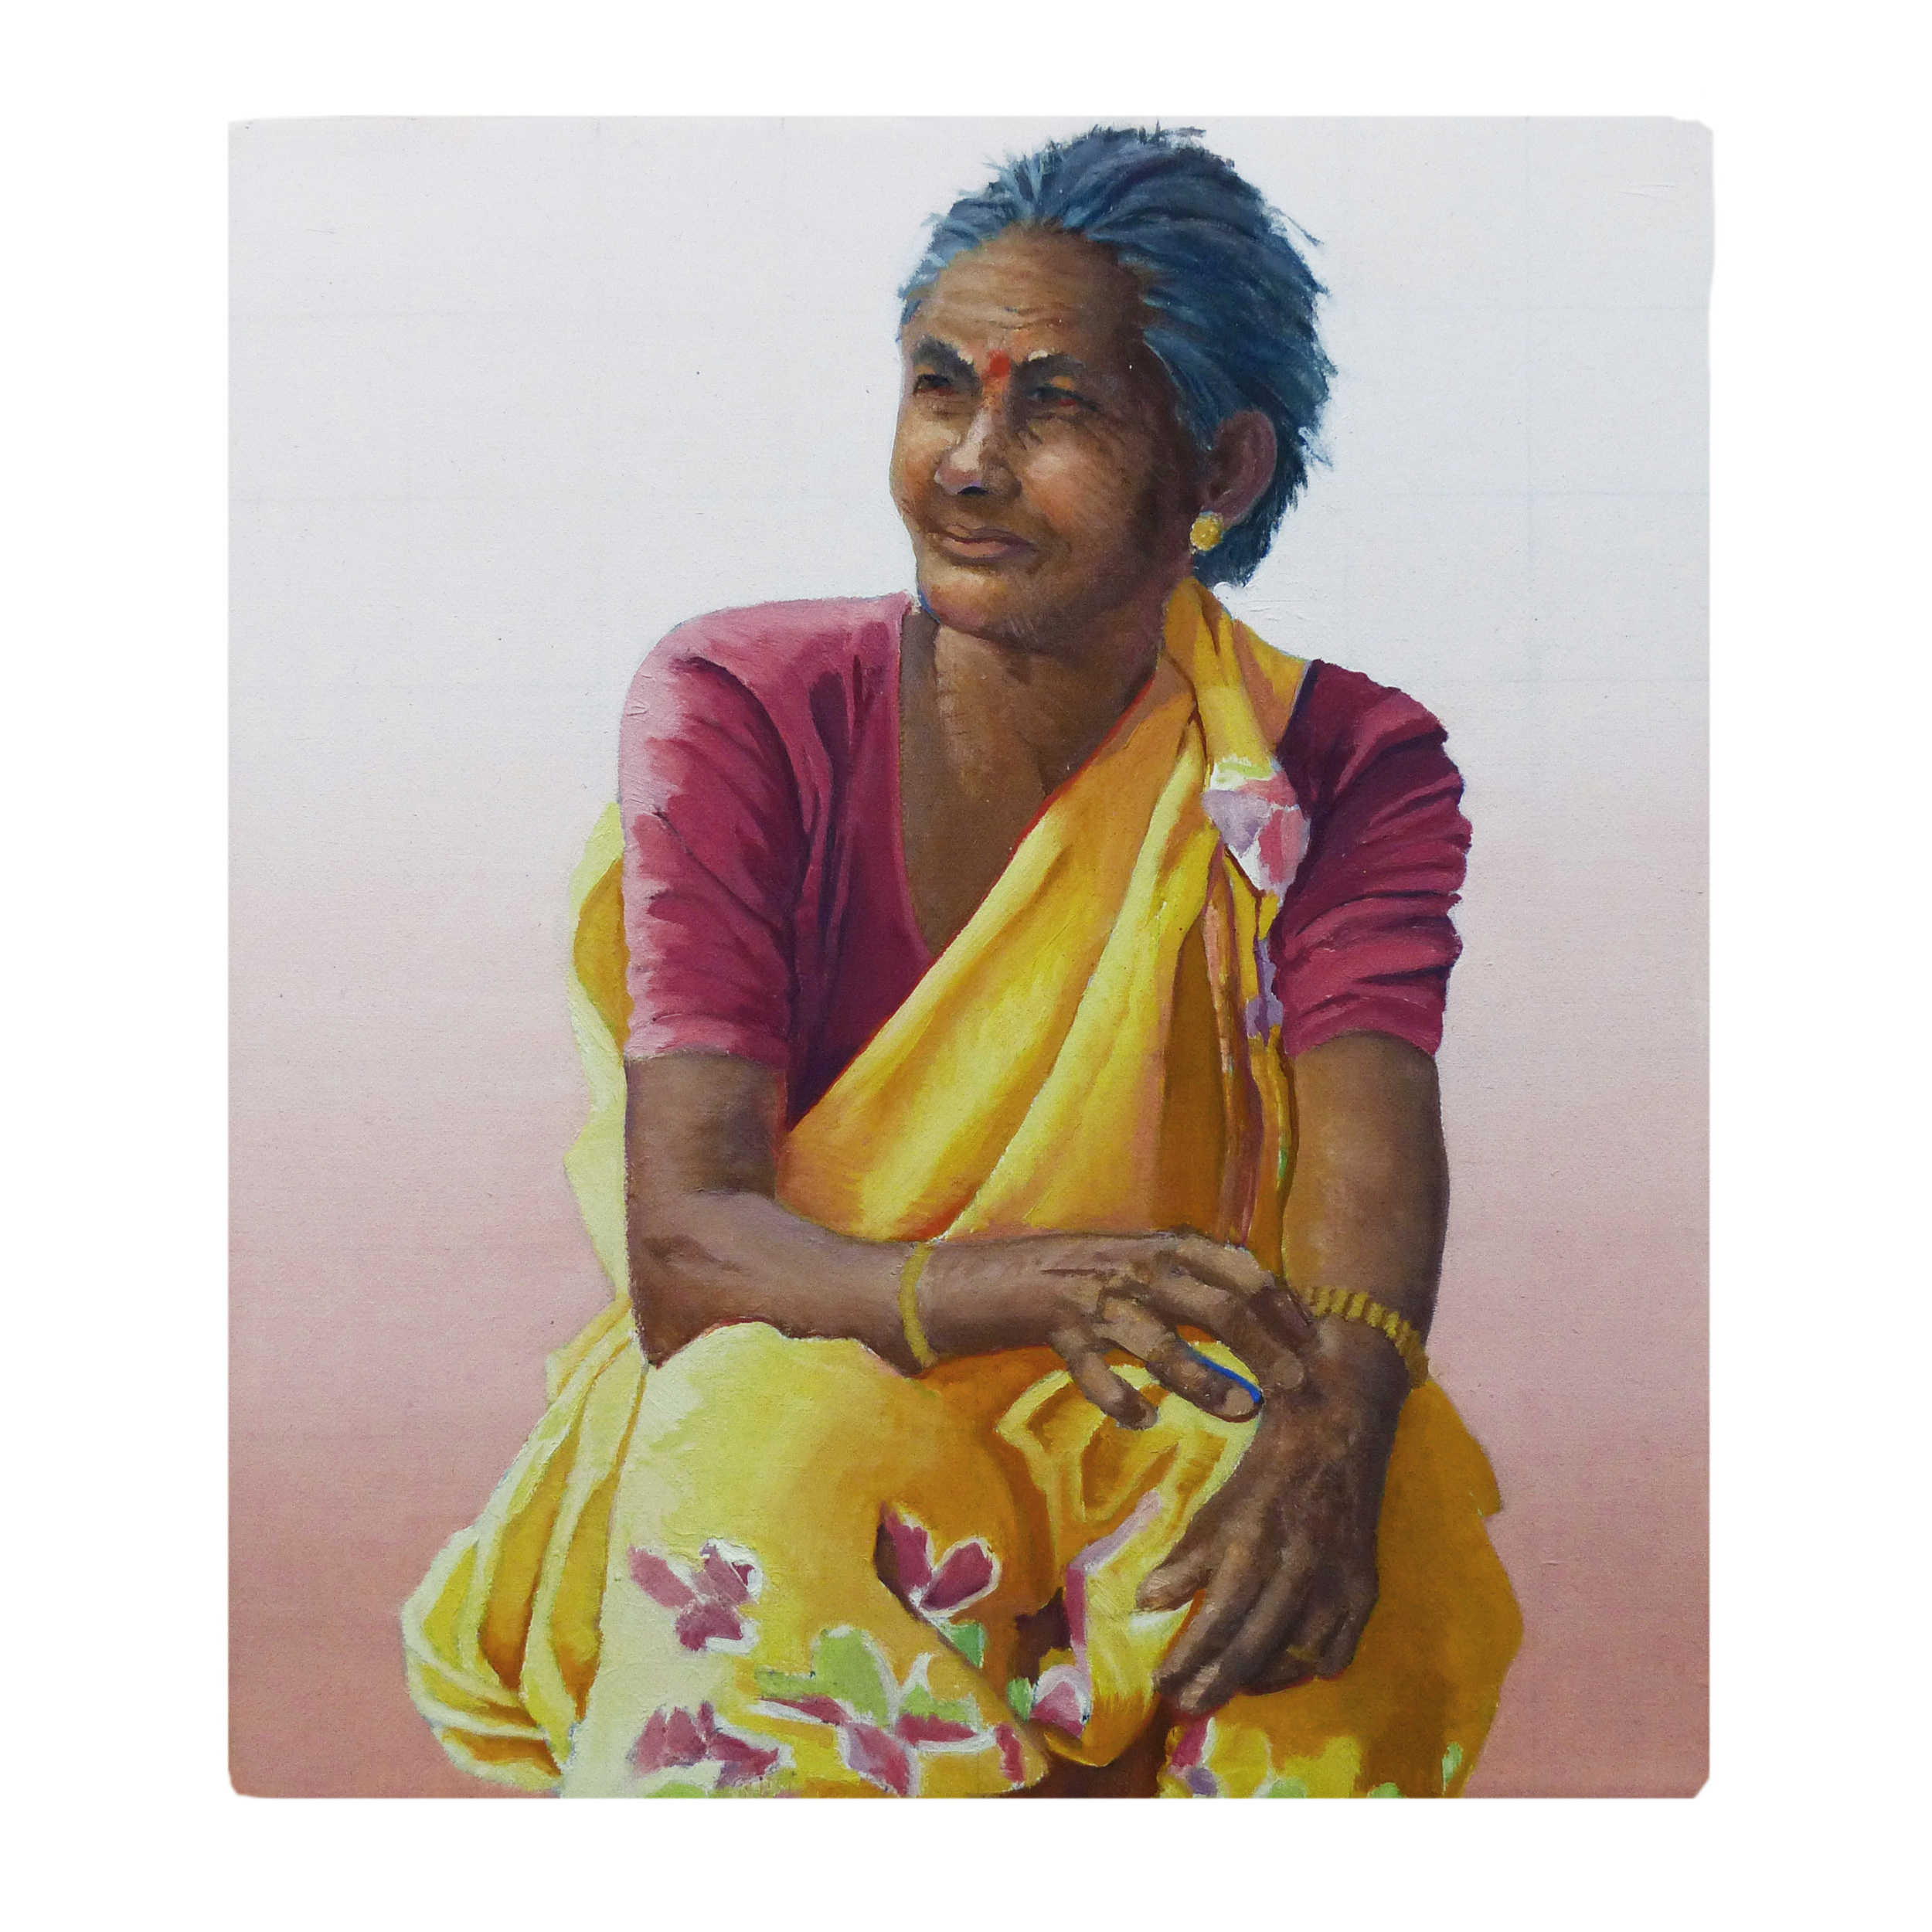 Shallot Woman: India, 2013